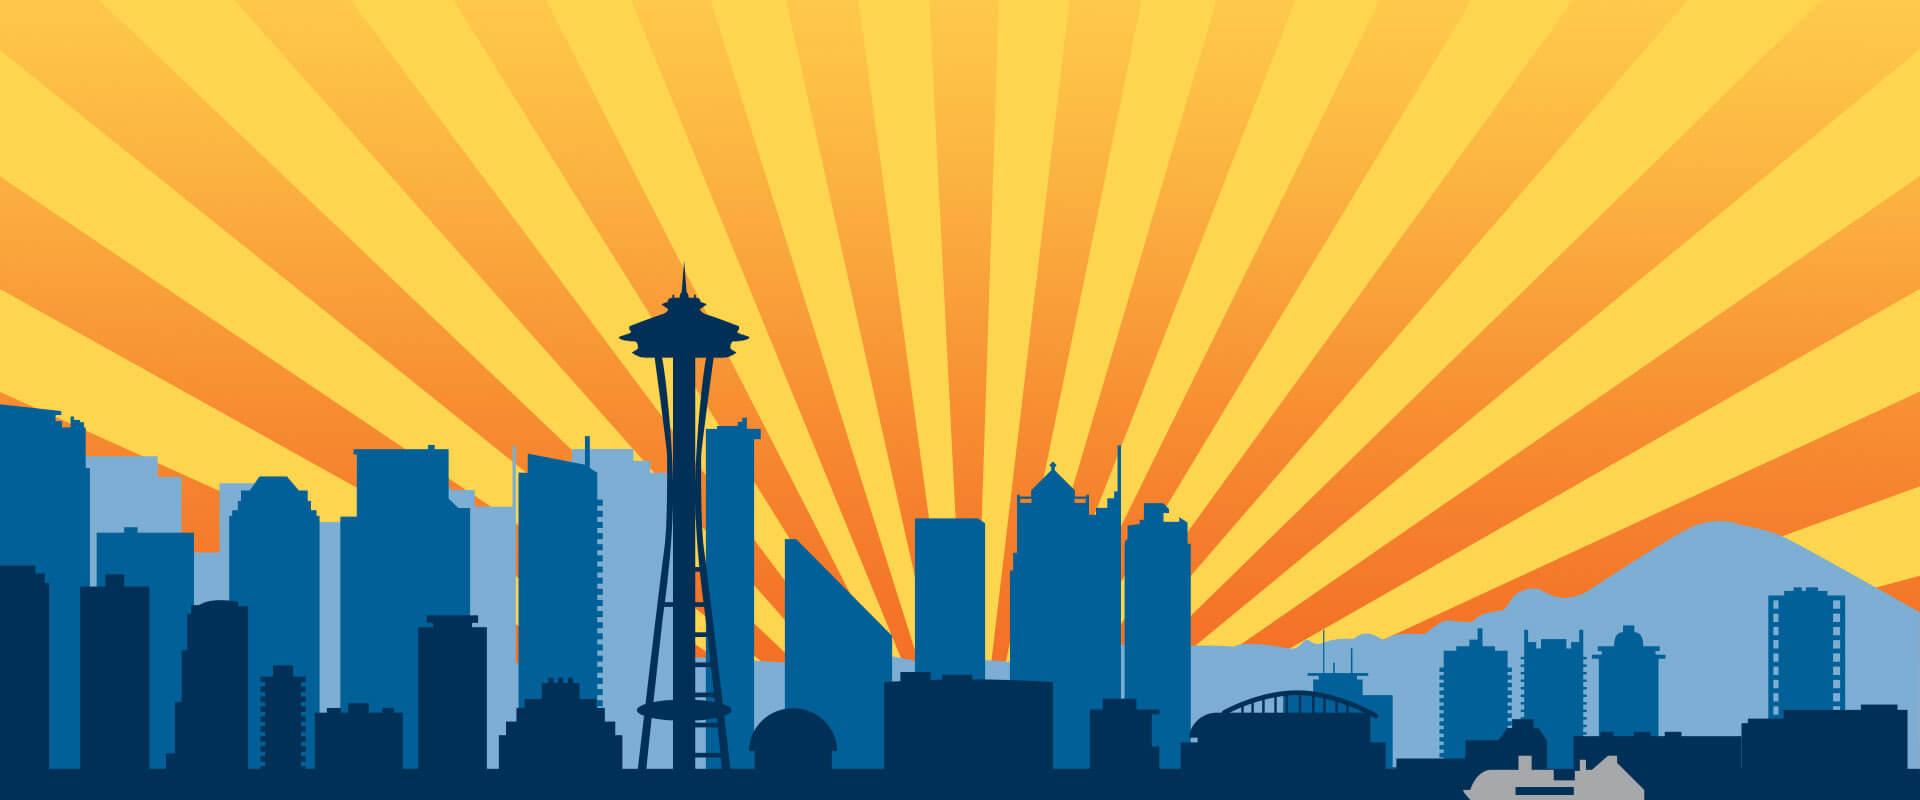 Seattle Housing Market Predictions for 2018 | Beachworks LLC